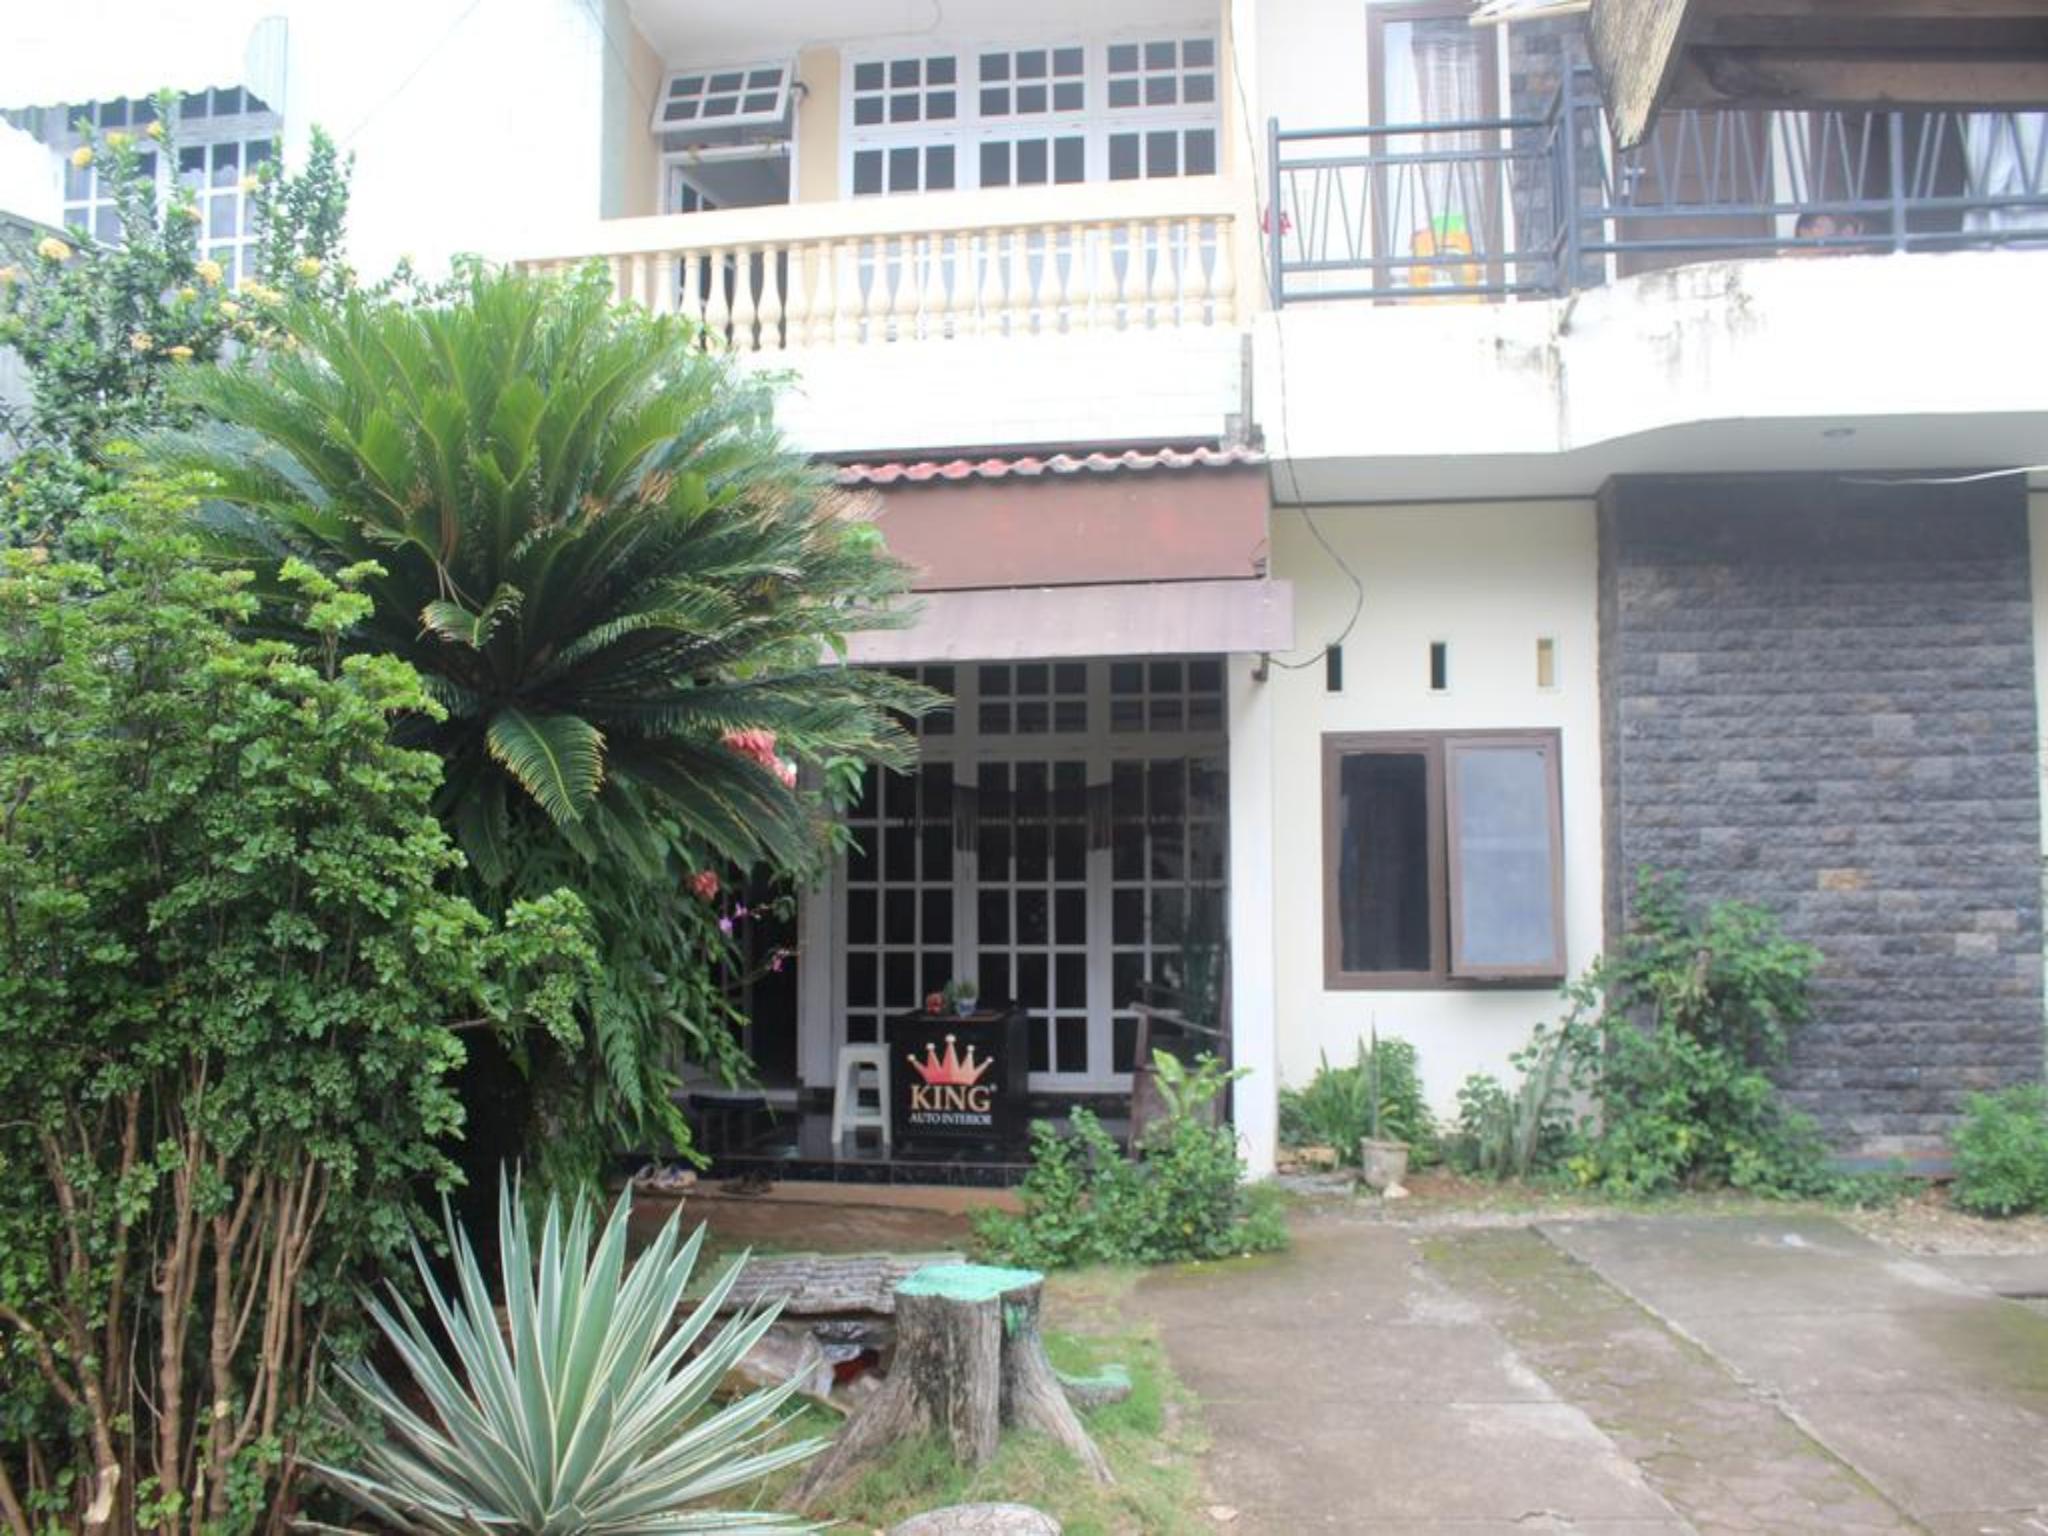 Rumah Landee Homestay 2, Maros